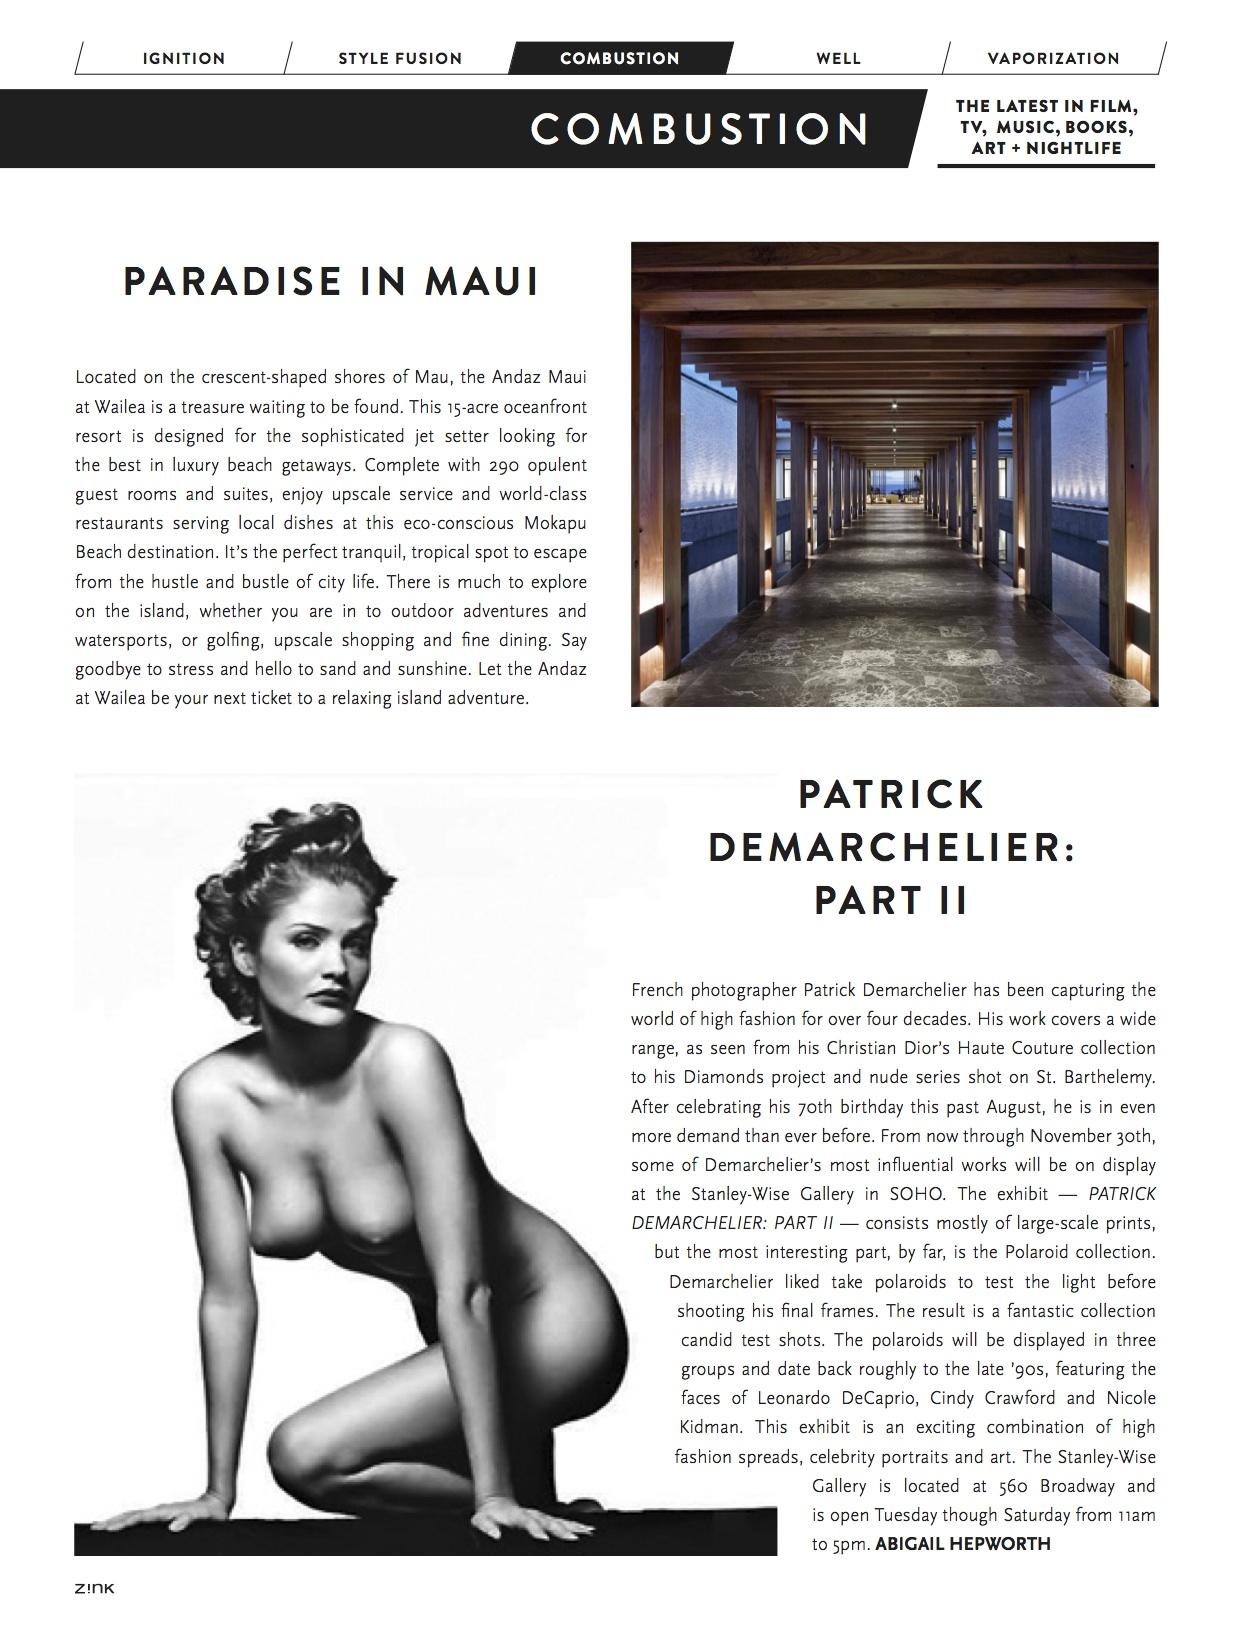 ZINK Magazine October 2013 issue